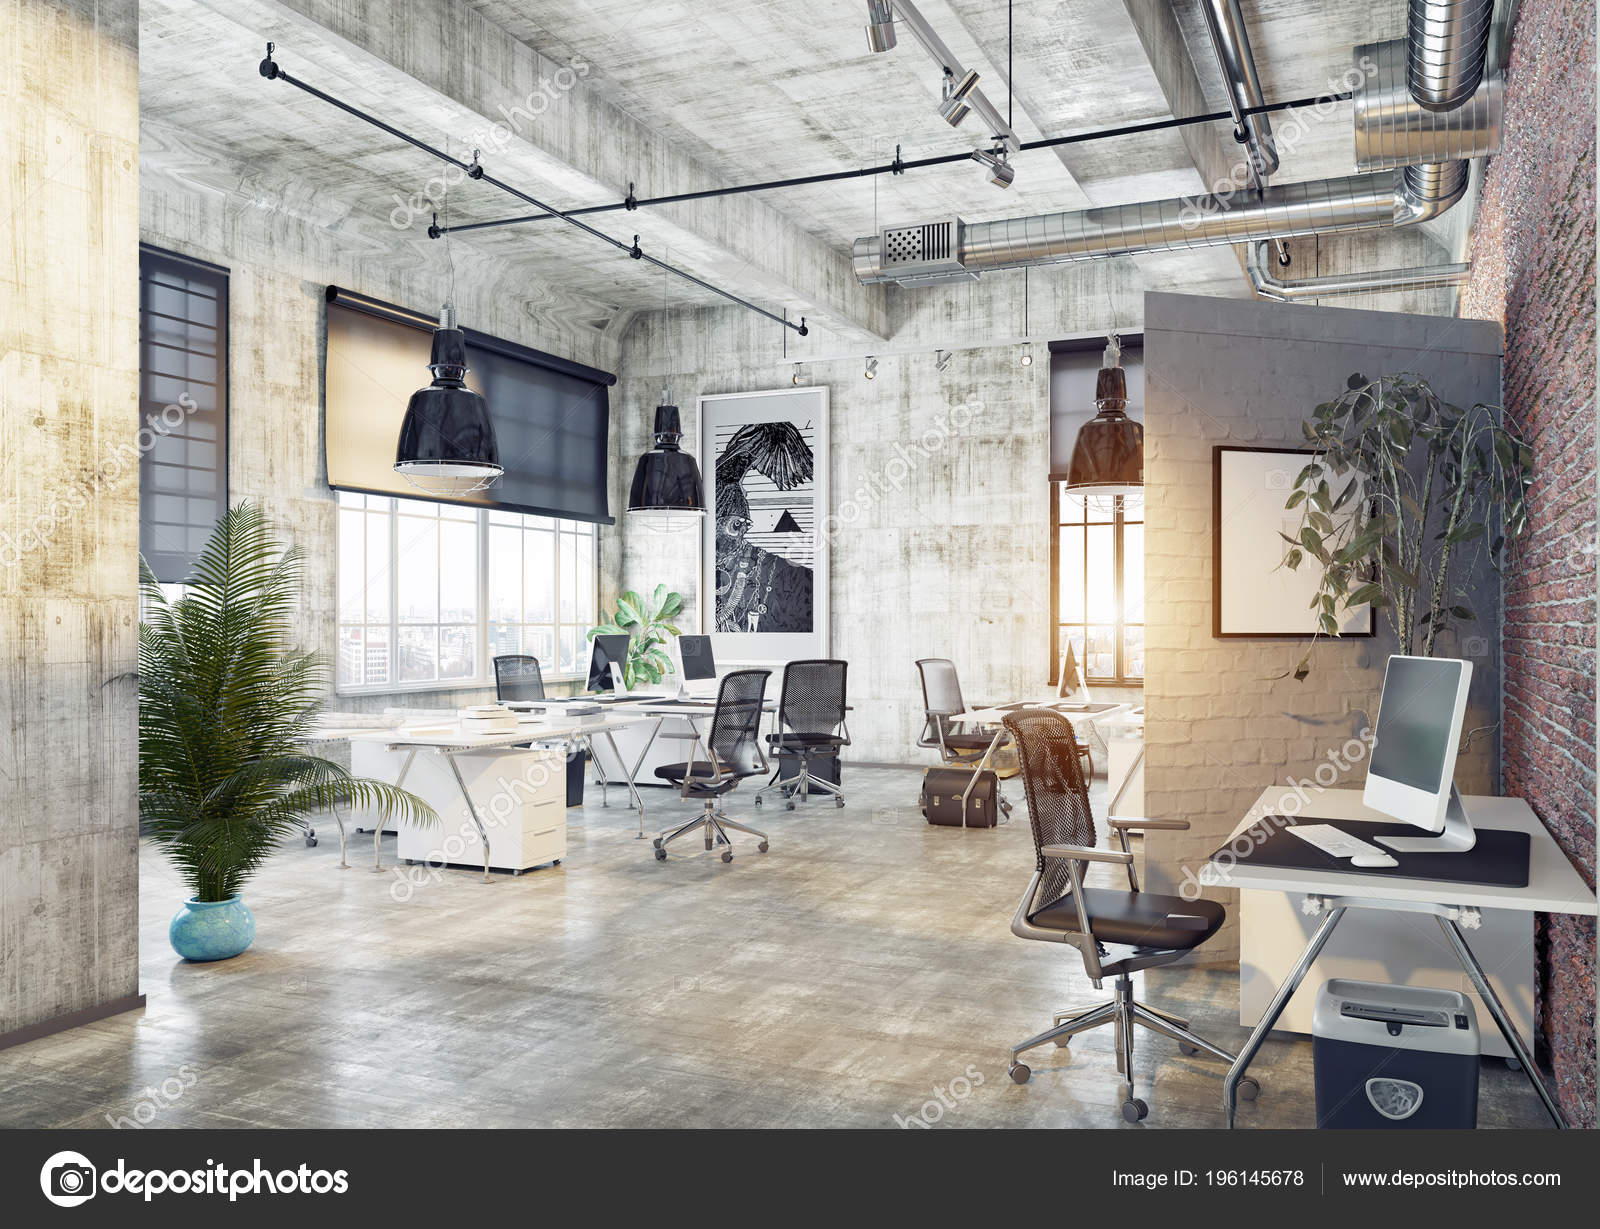 Beobachten Blick Auf Moderne Coworking Loft Buro Rendering Konzept